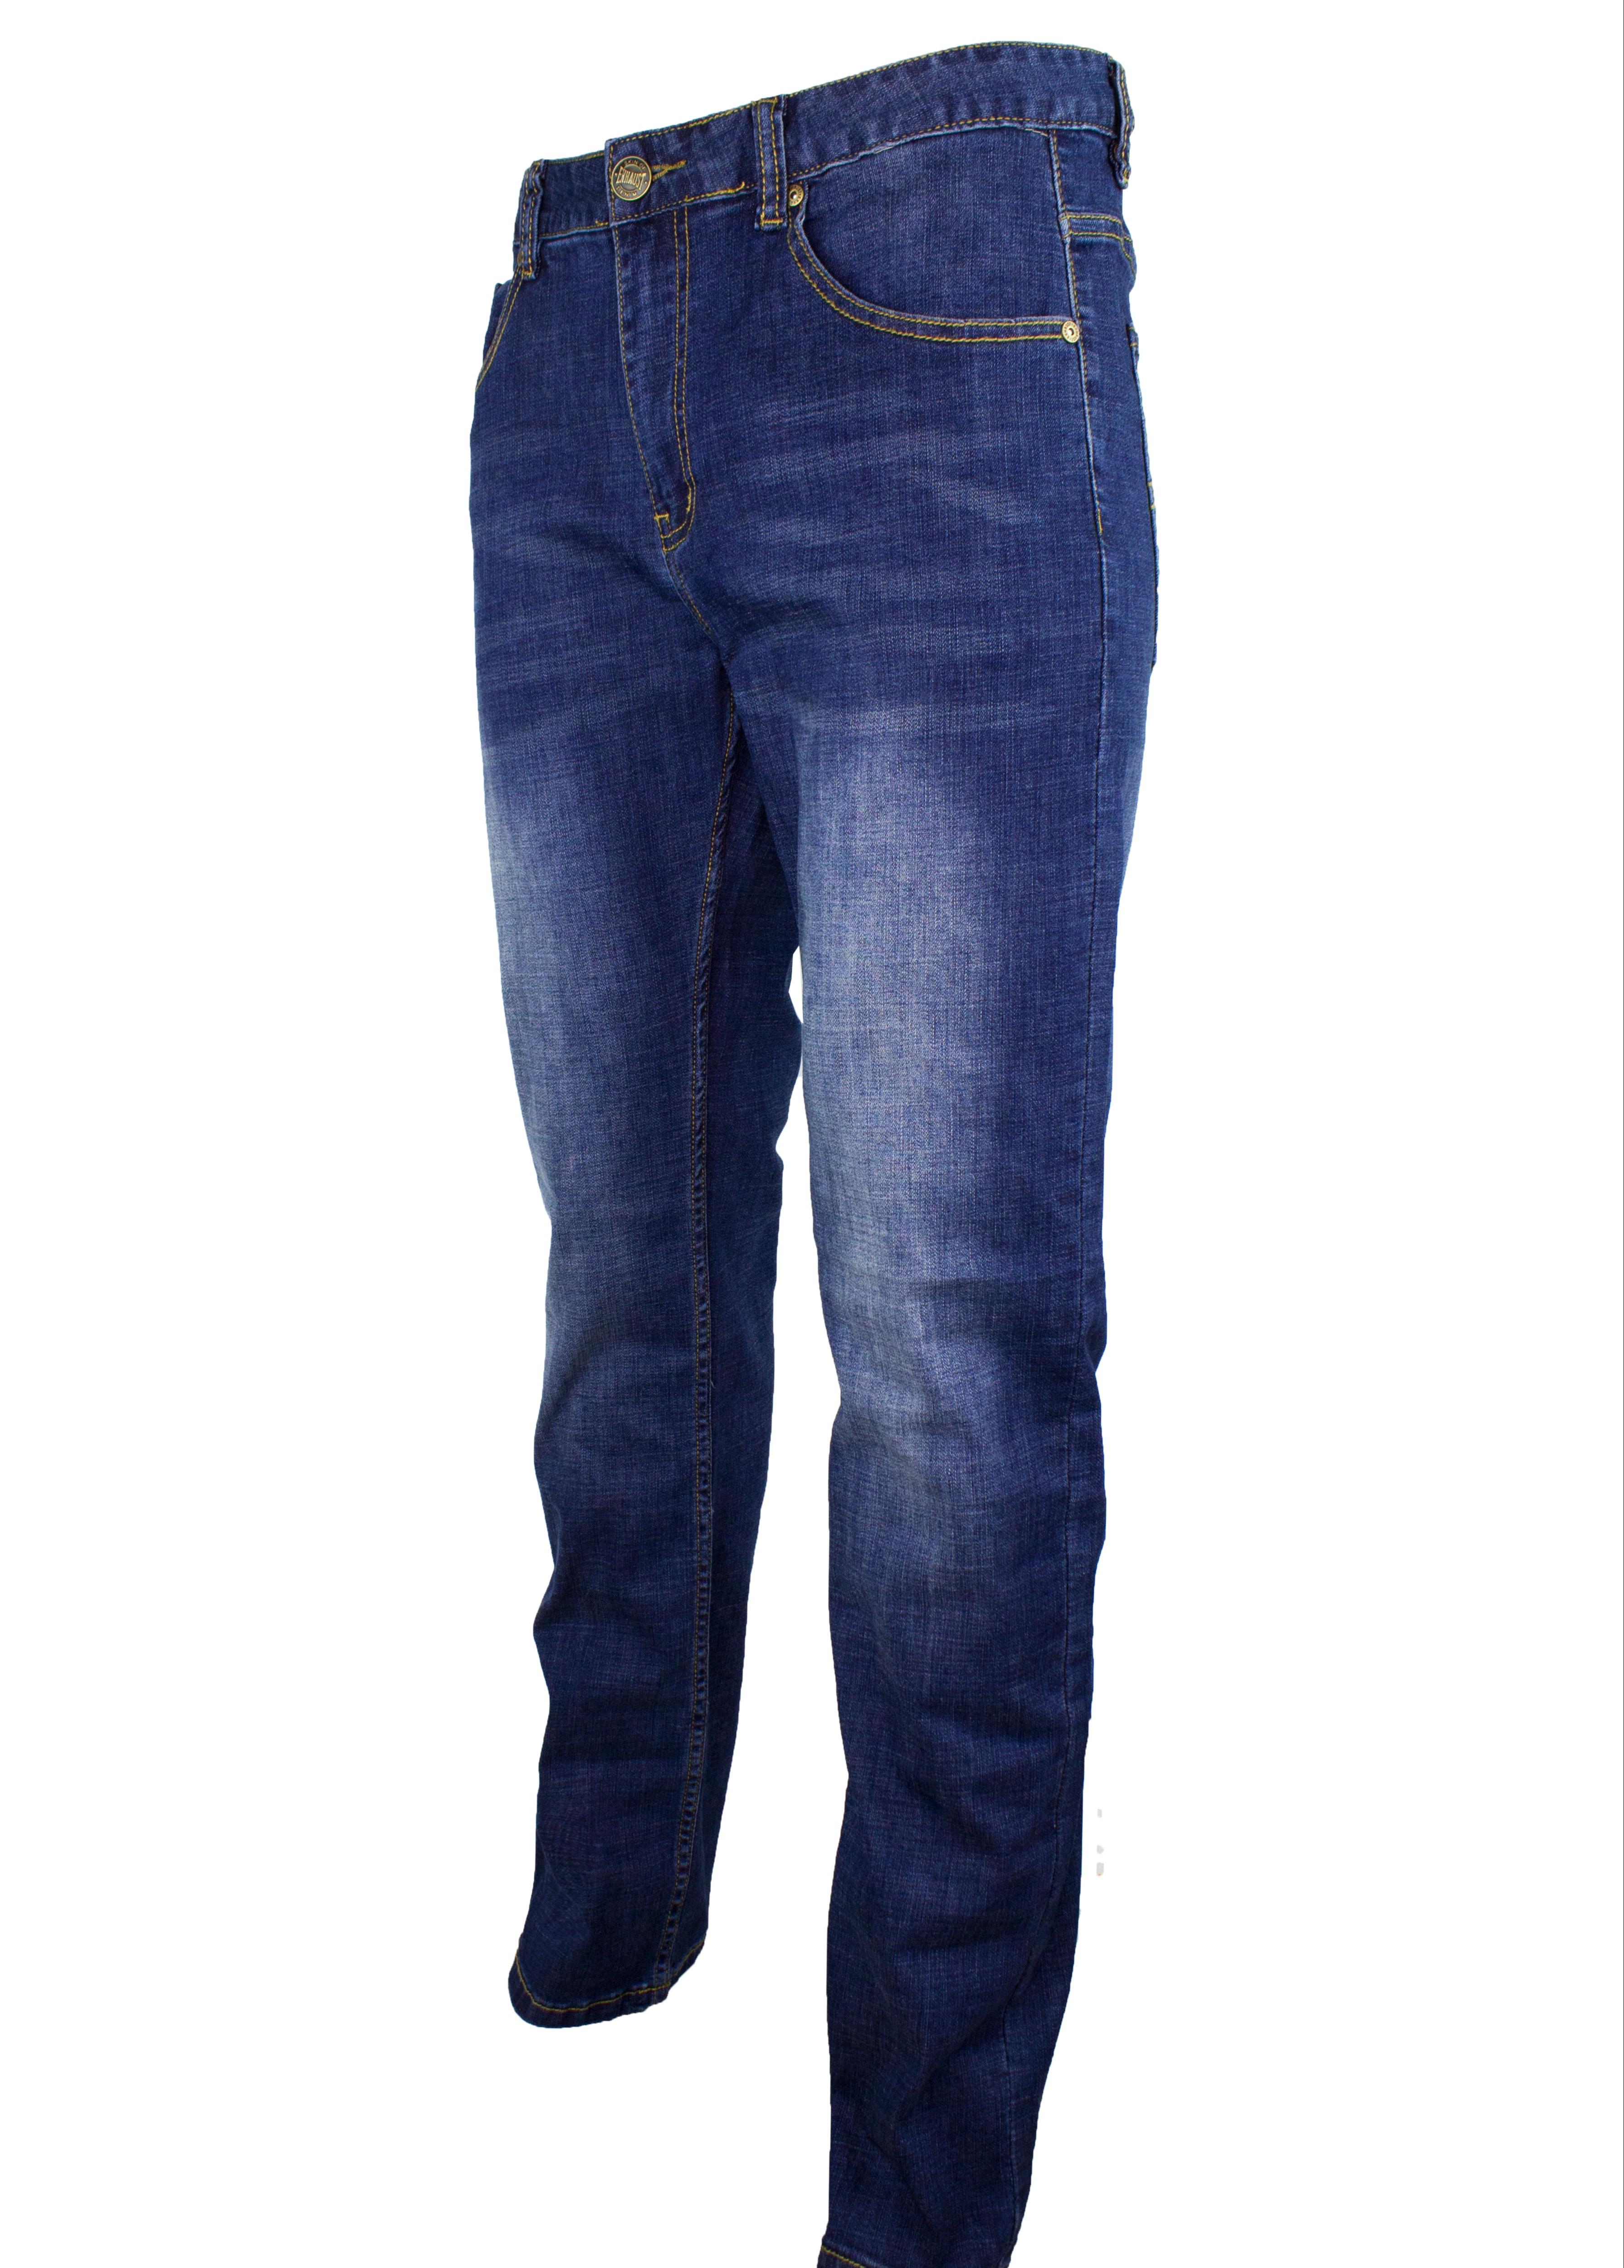 Stretchable Denim Long Pants Straight Cut 910